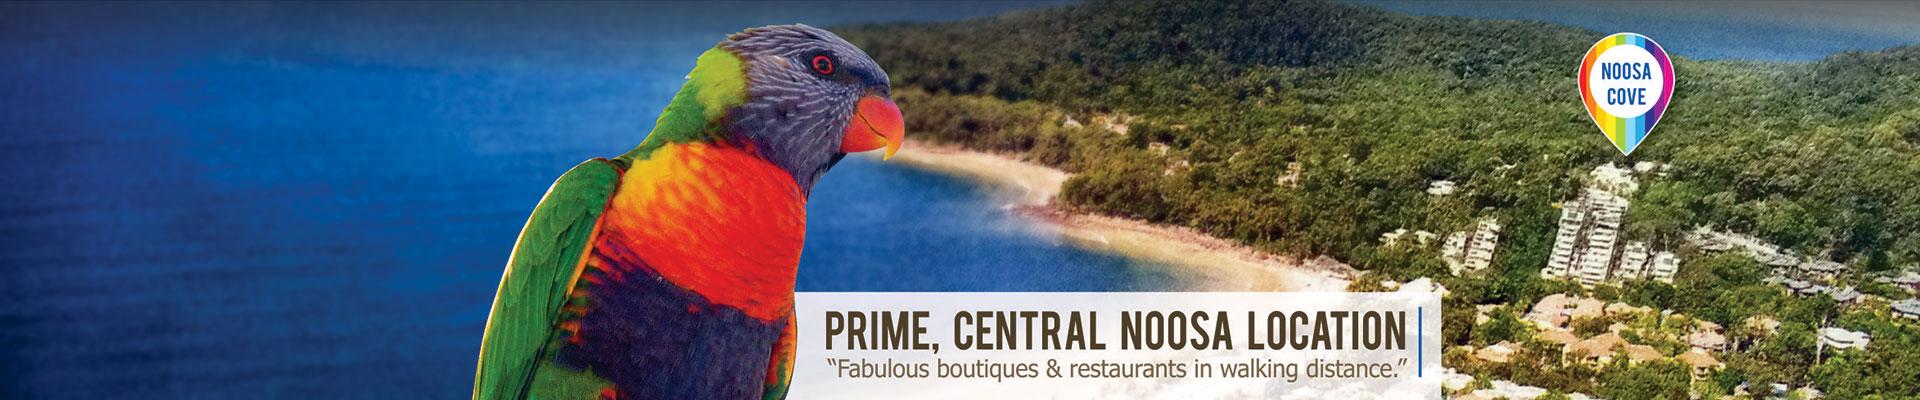 Prime, central Noosa location